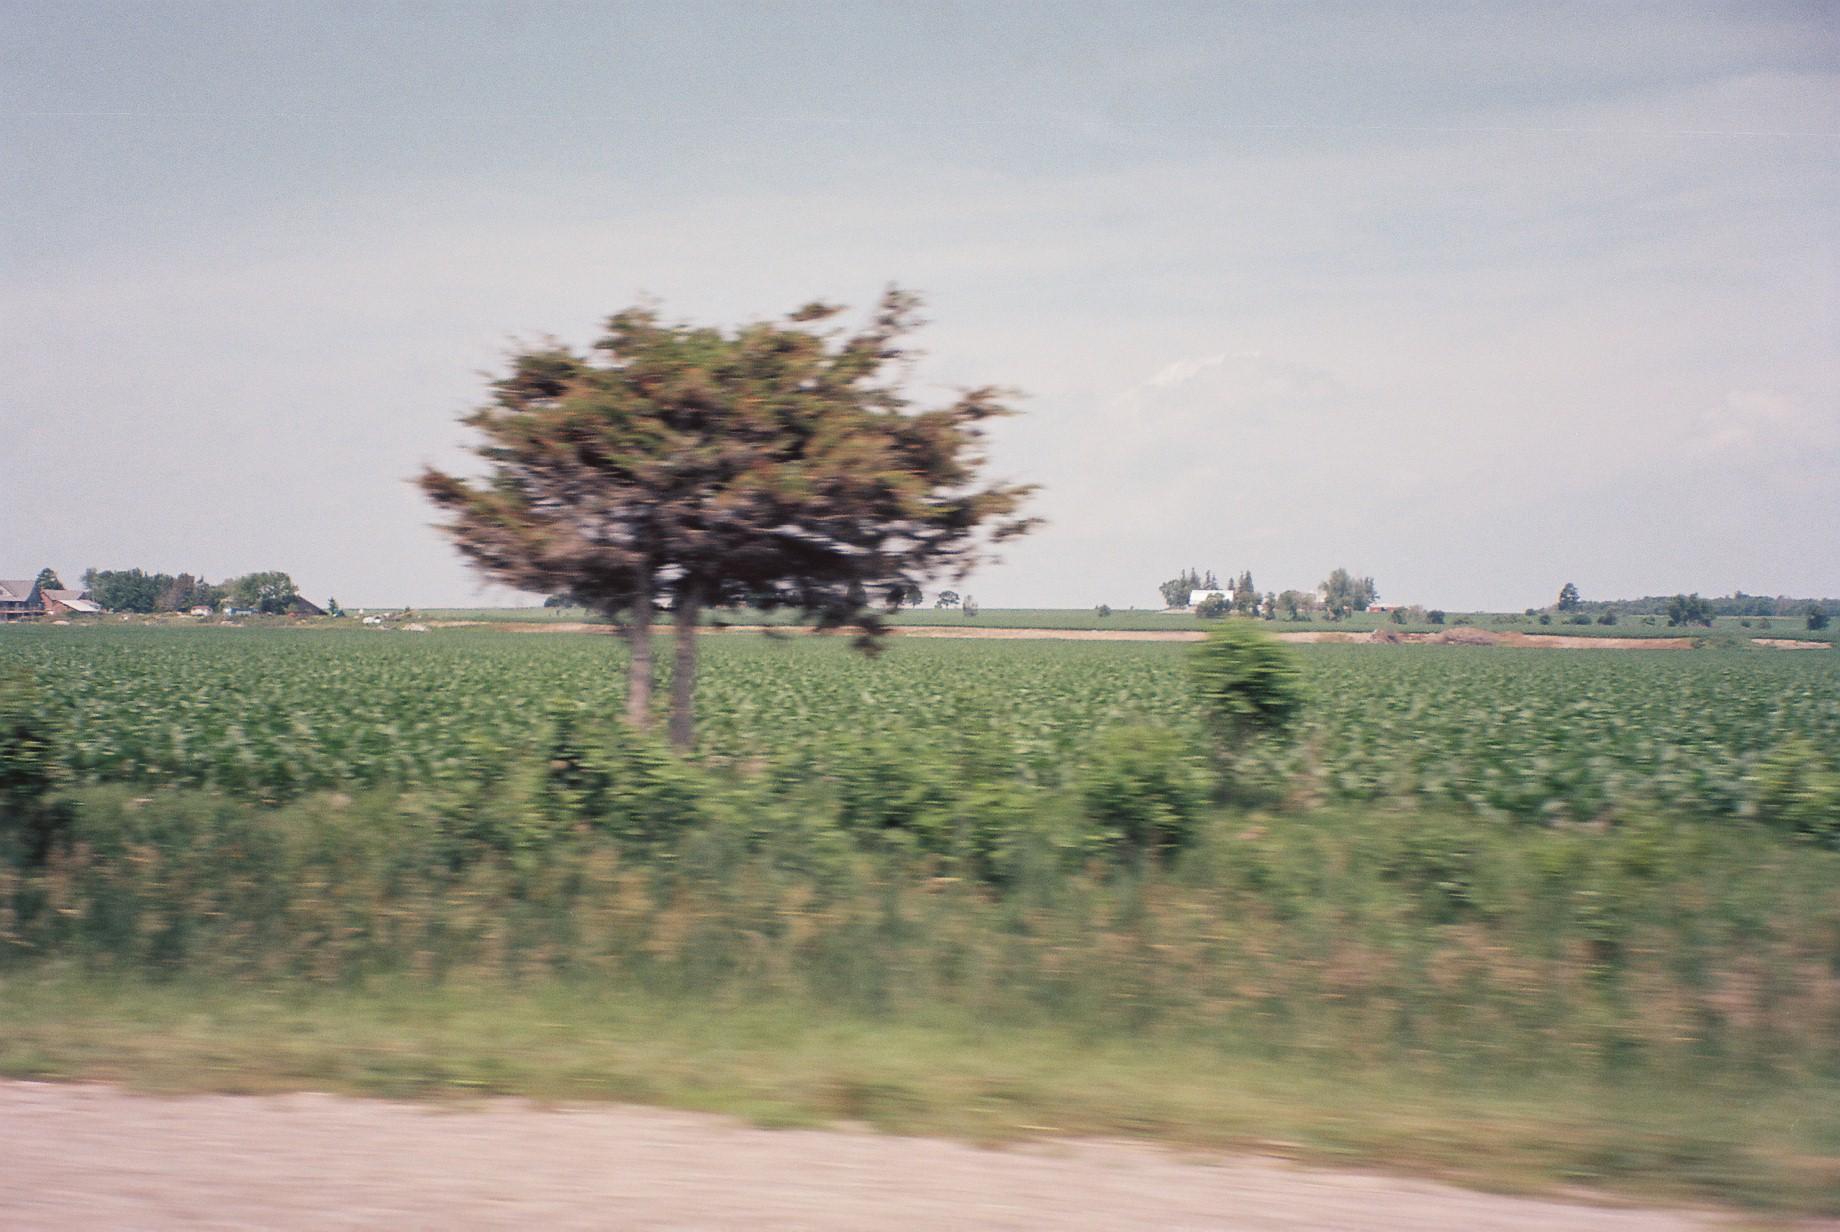 untitled shoot-3710137.JPG